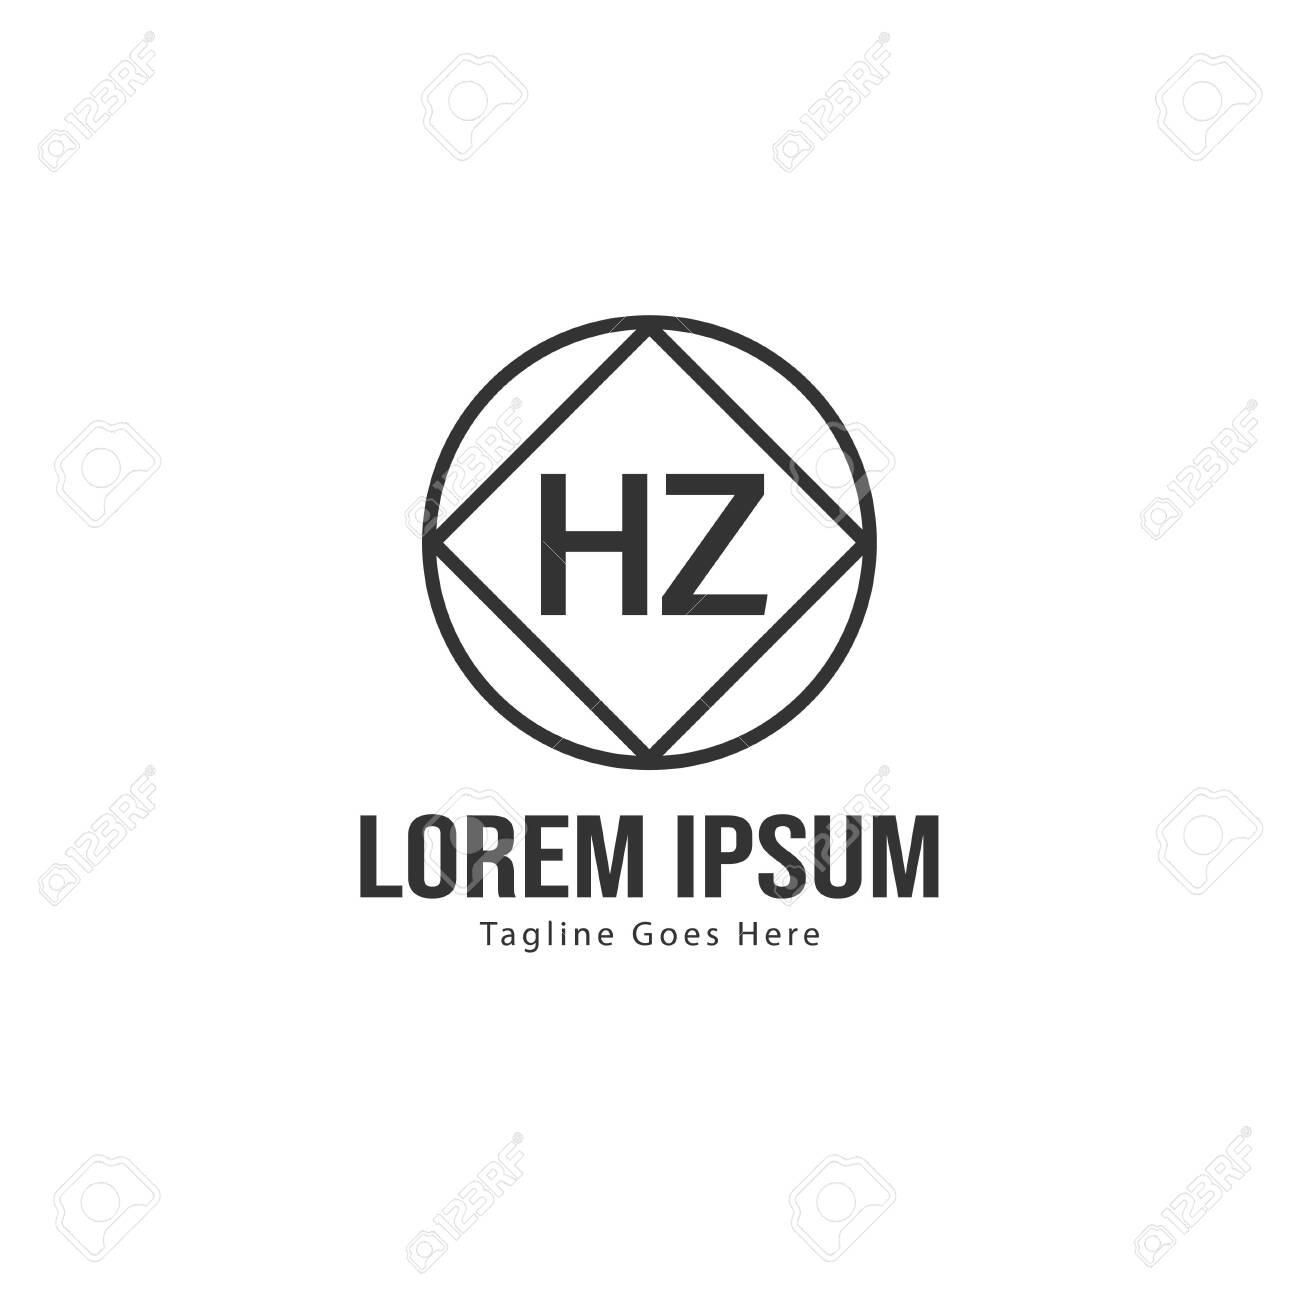 Initial HZ logo template with modern frame. Minimalist HZ letter logo vector illustration - 128894928